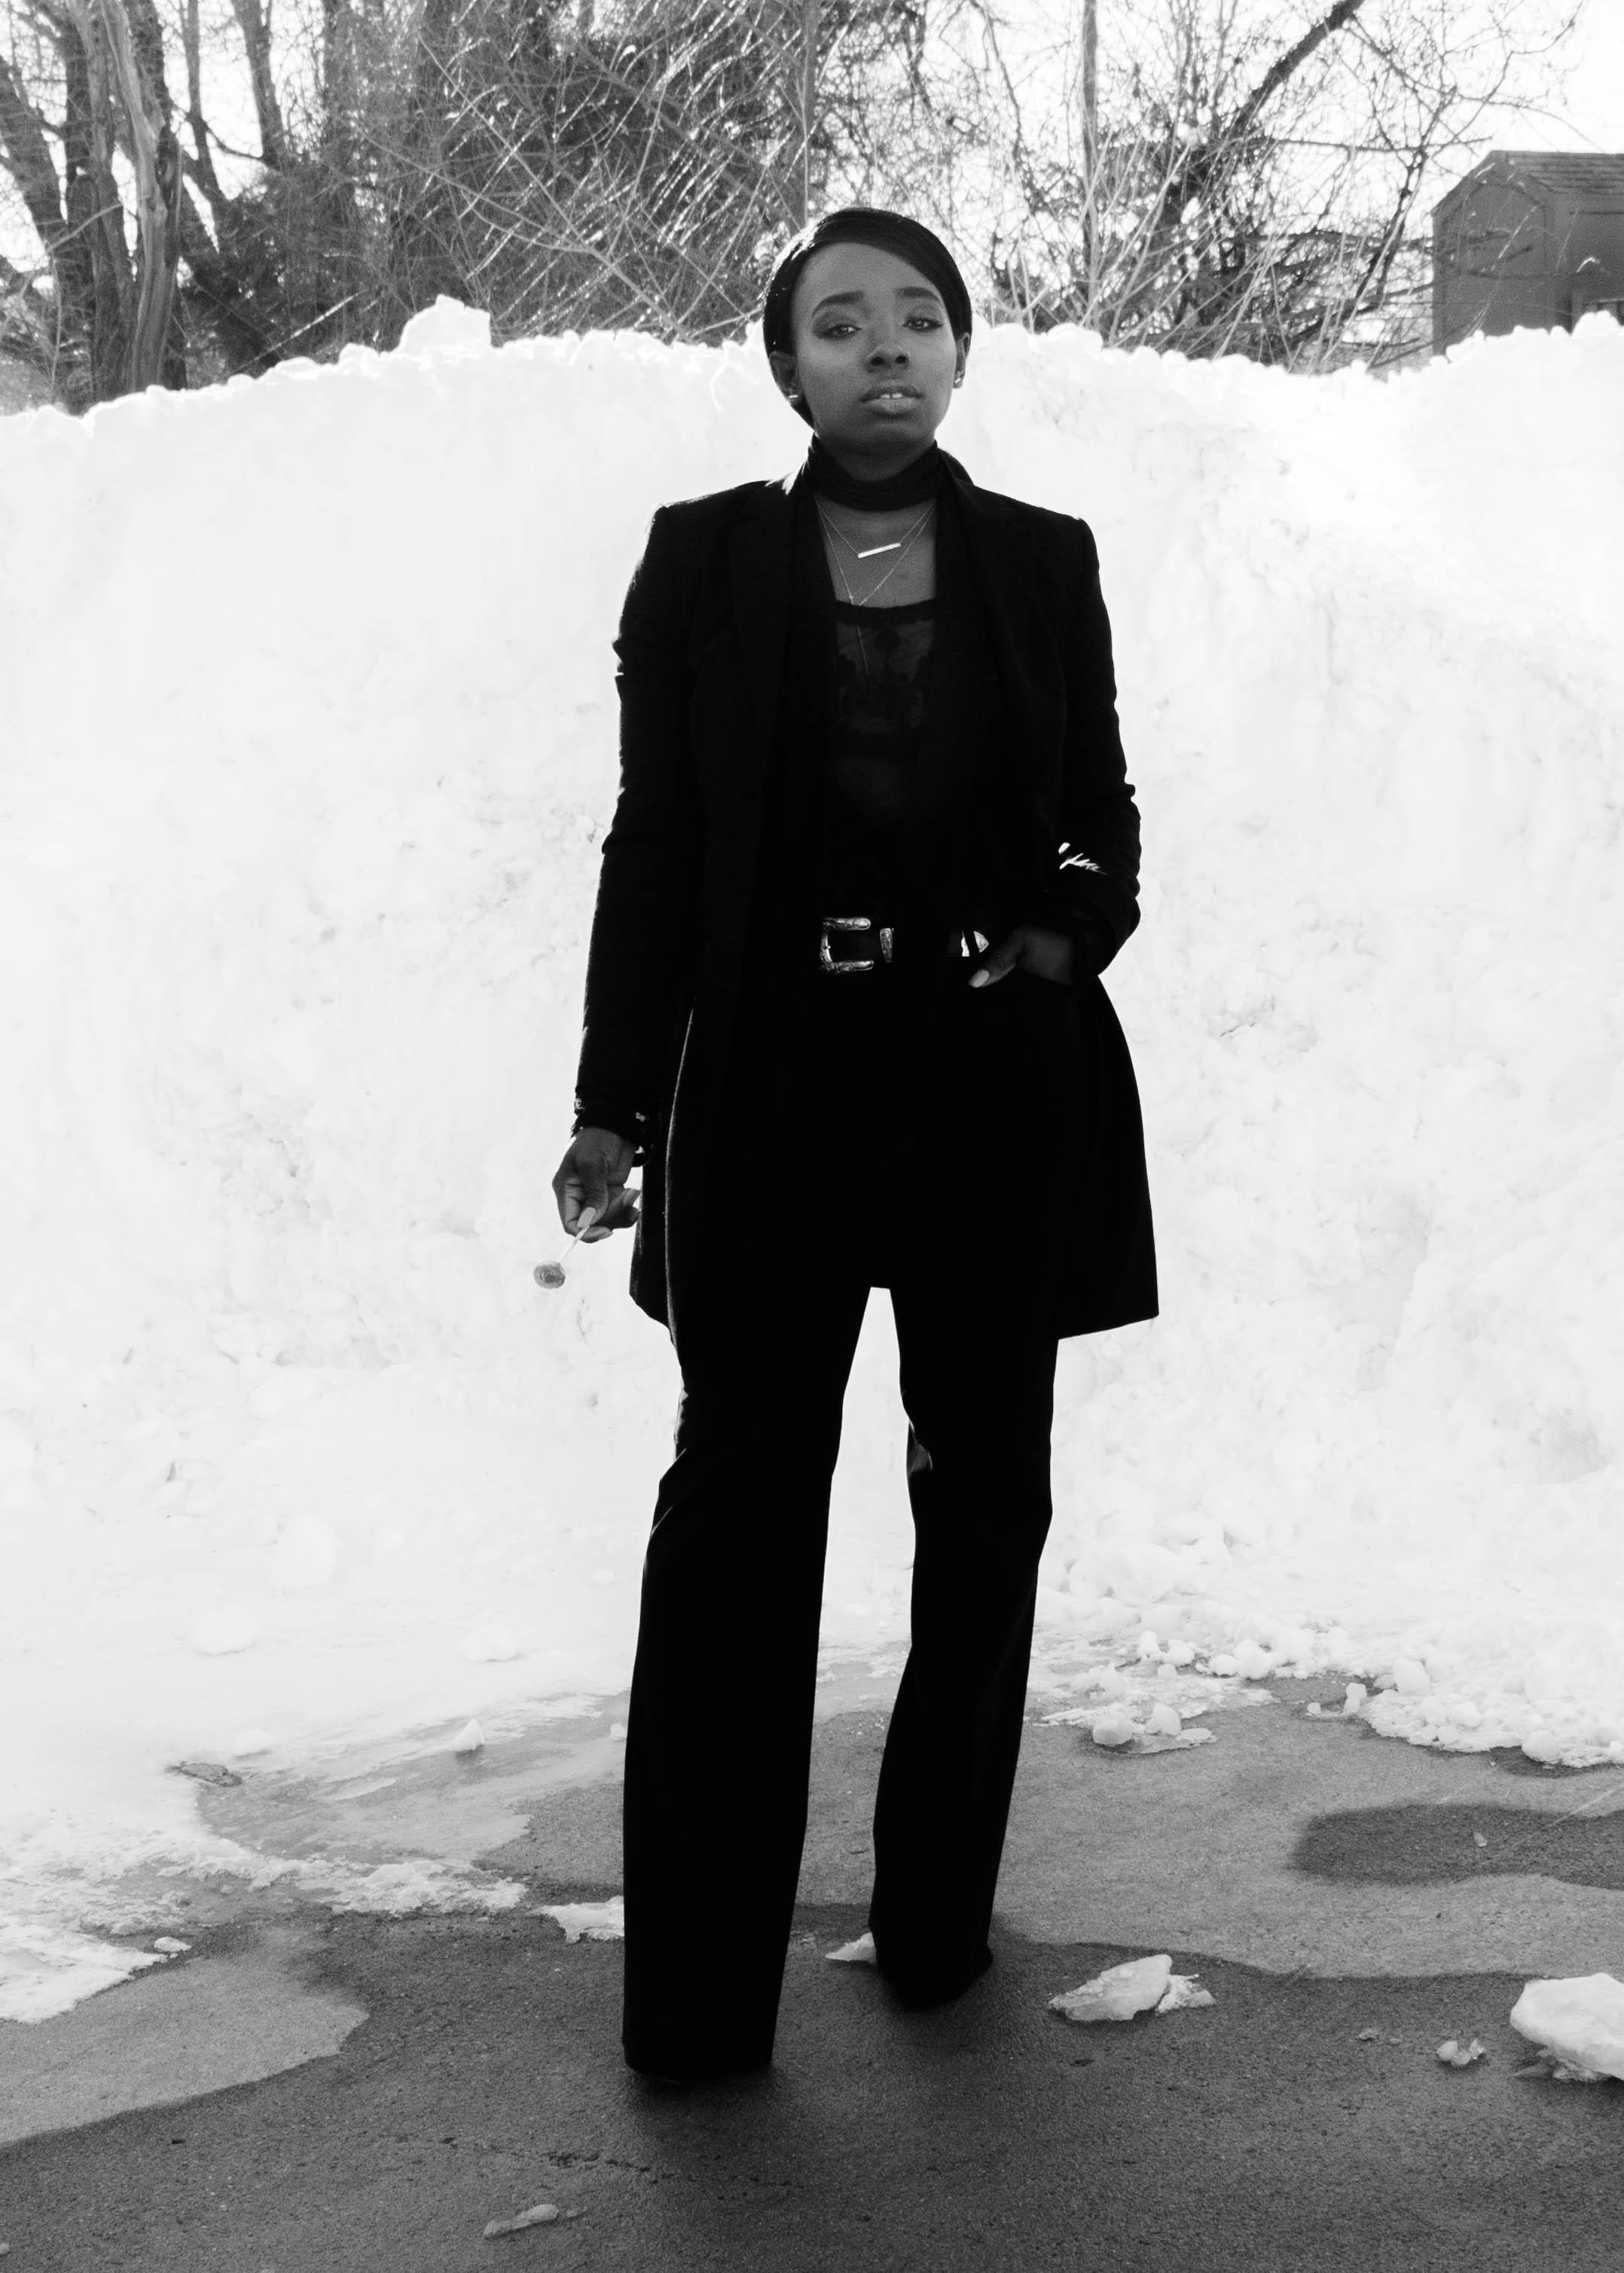 The_Glossier_Tasha_James_Style_Fashion_Blogger_DC_Winter_2016_Le_Smoking_Suit_YSL-3.jpg